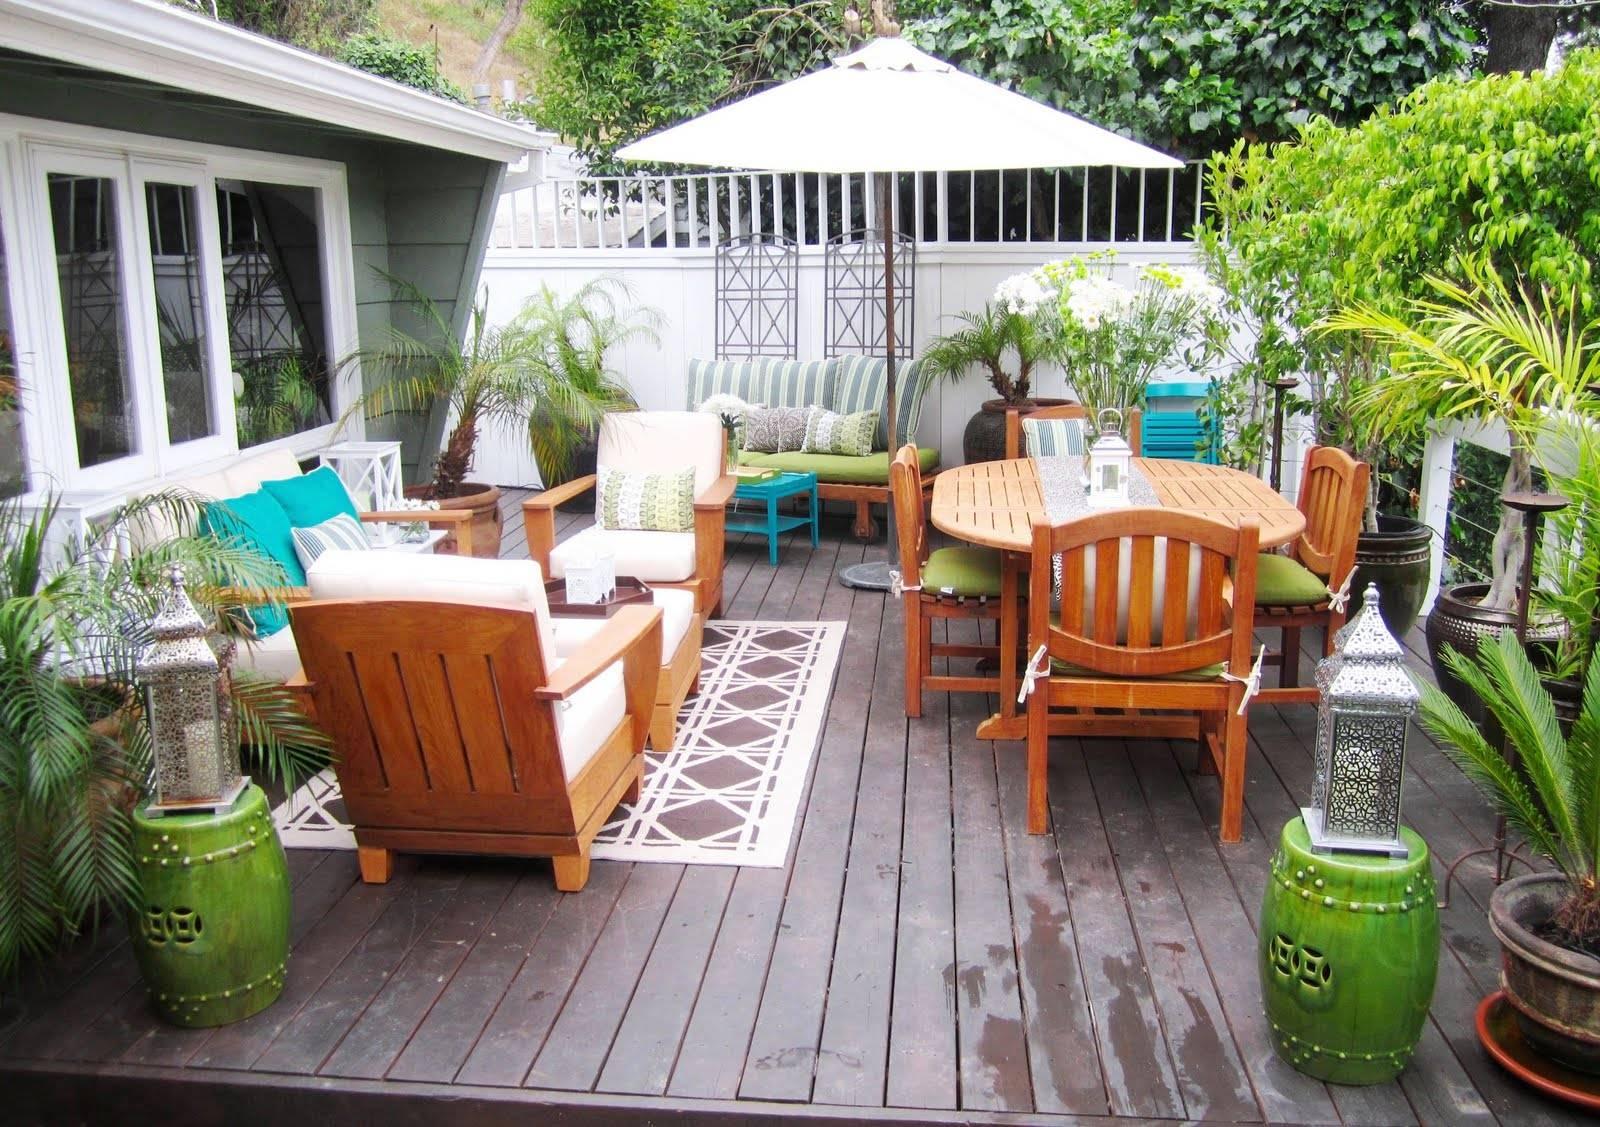 Outdoor Deck Designs Decorating Ideas Creative House Plans 57816